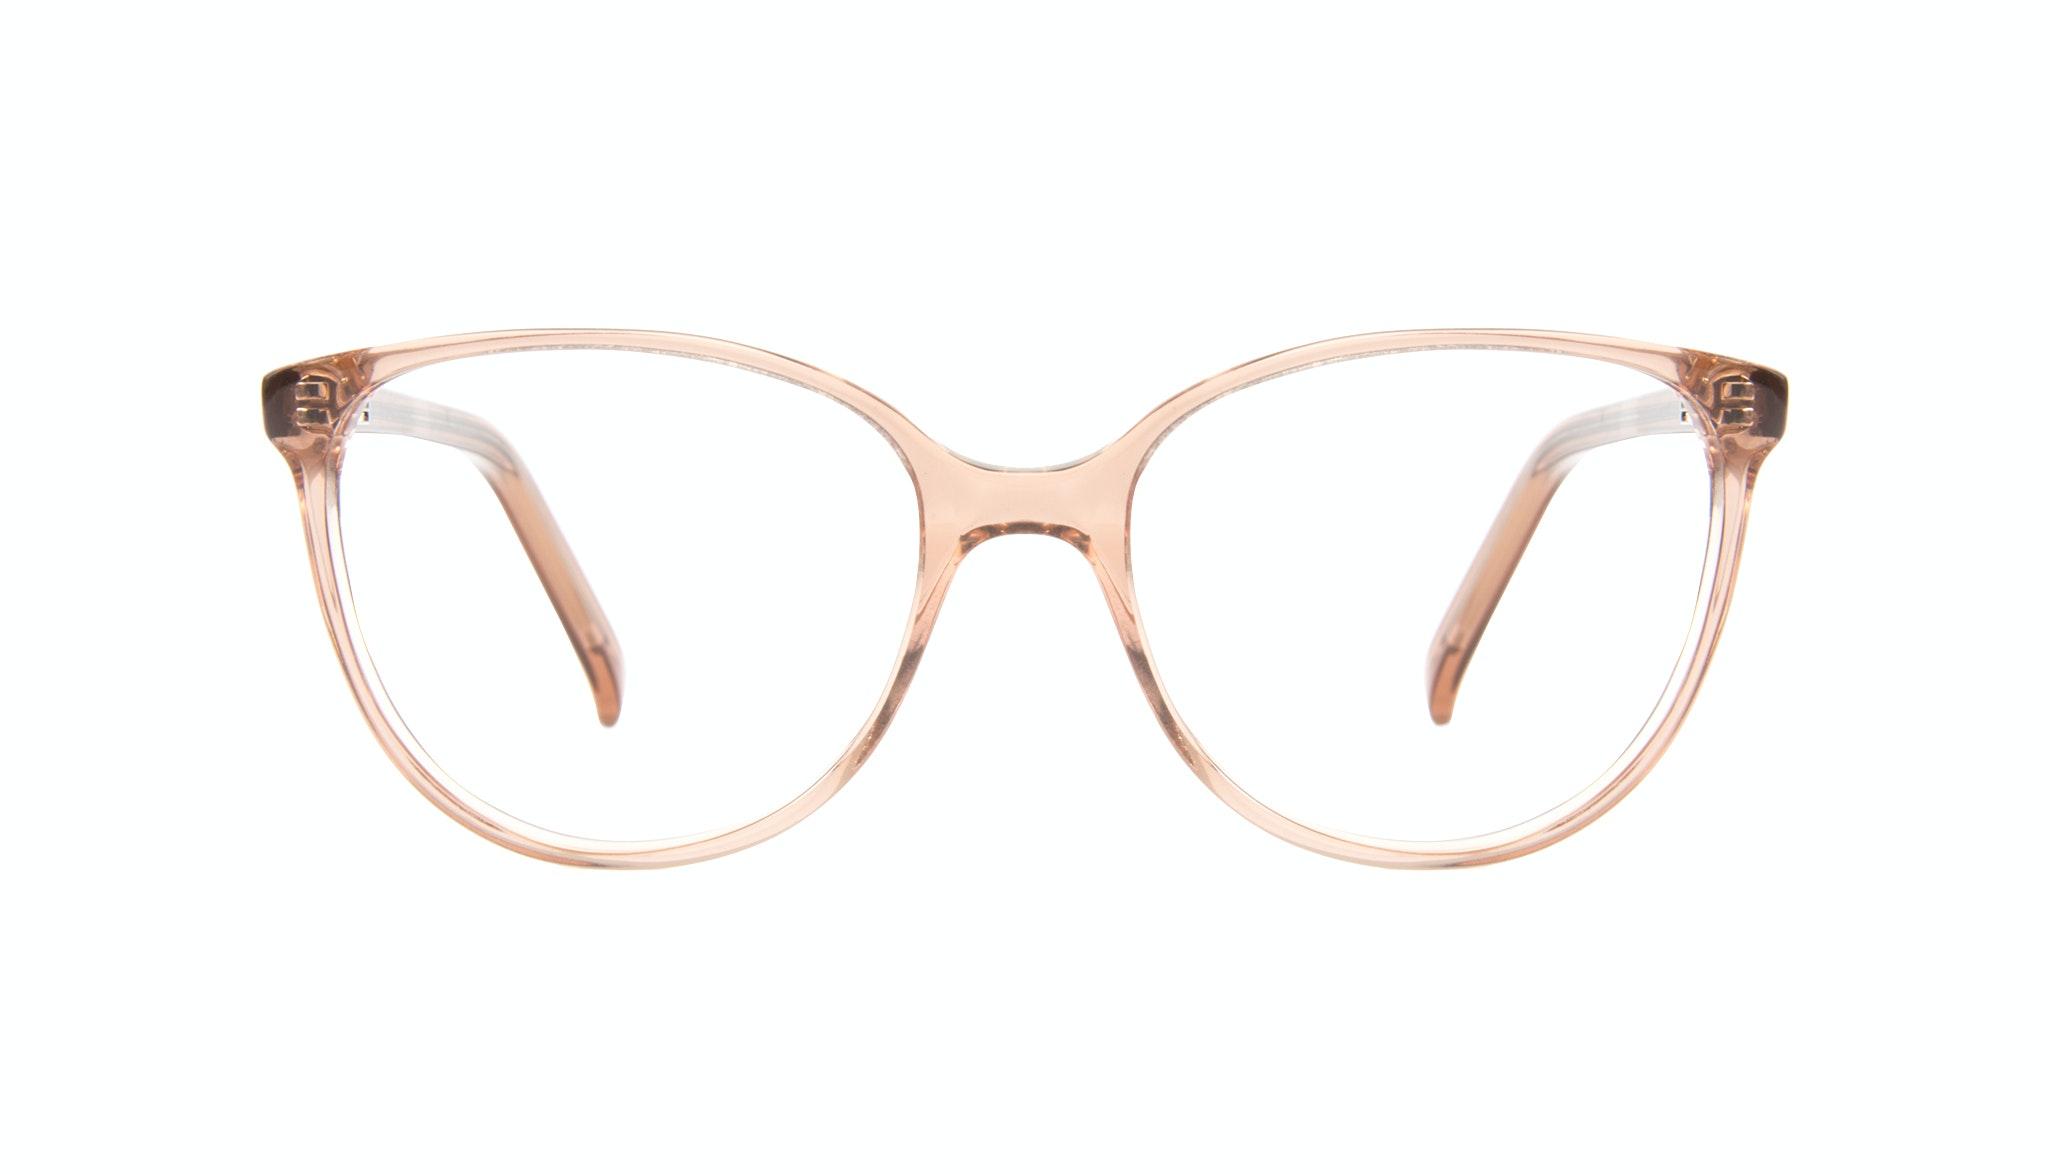 Affordable Fashion Glasses Cat Eye Eyeglasses Women Imagine Petite Rose